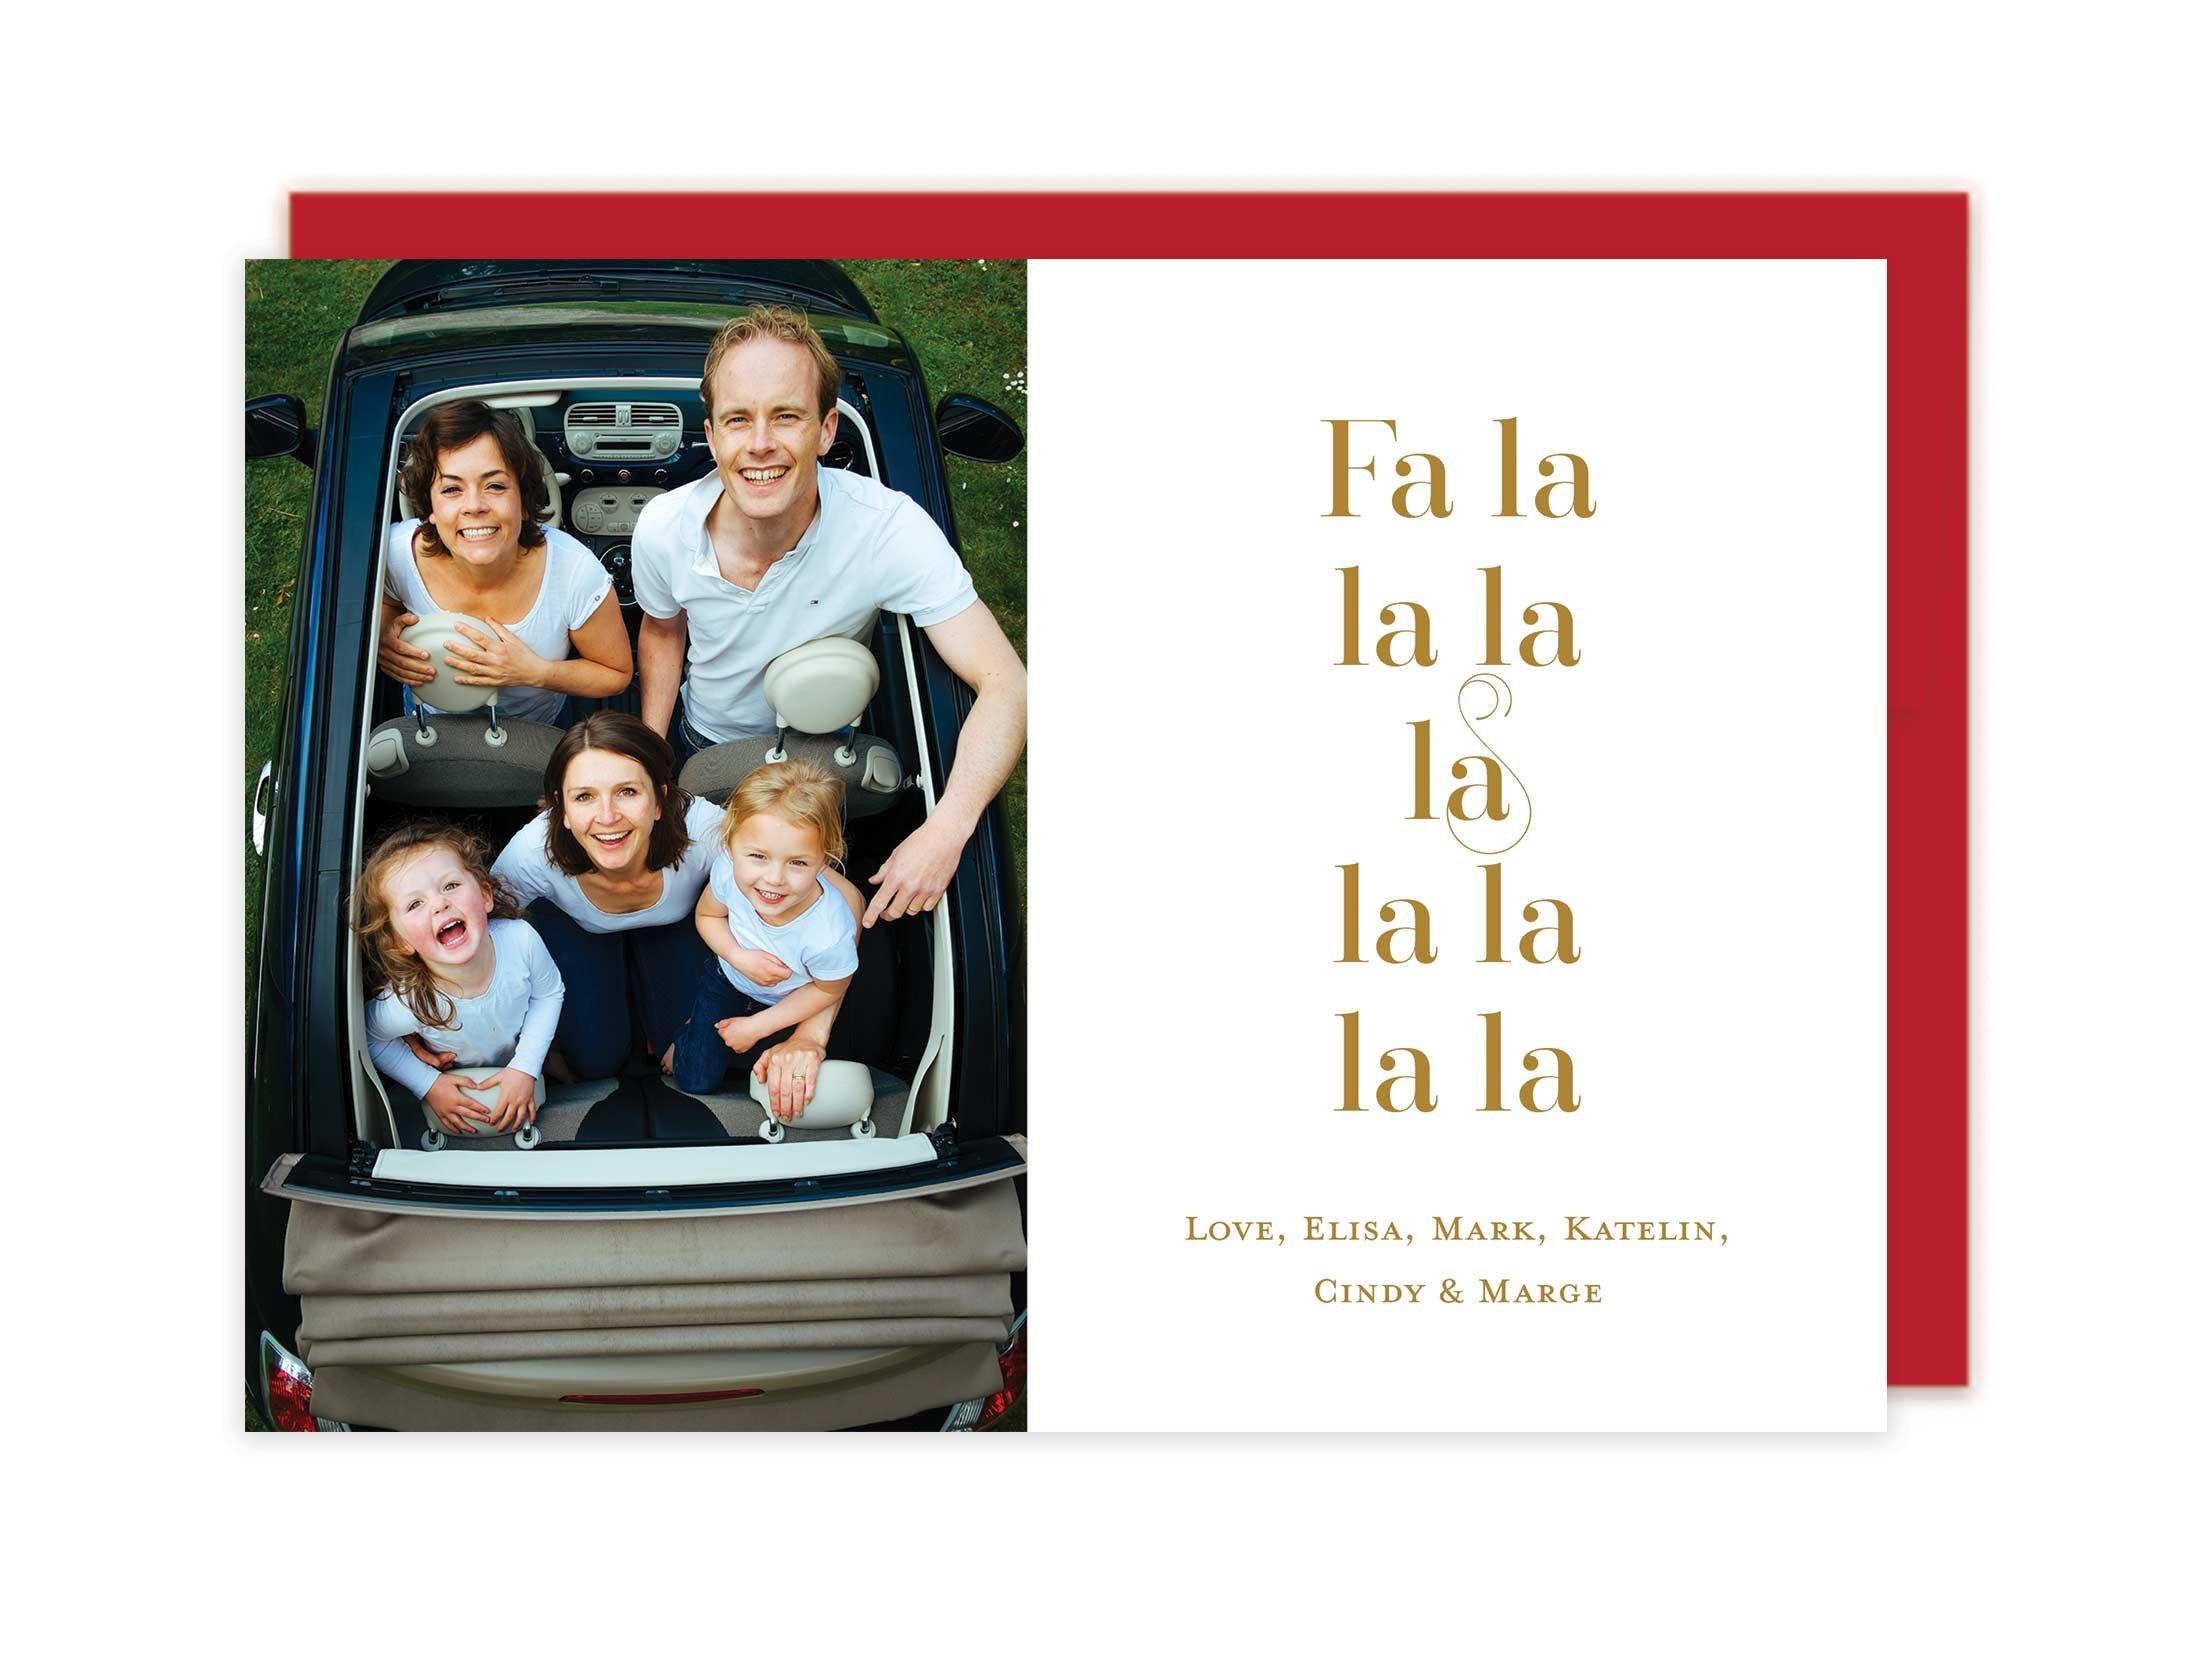 Letterpress Photo Christmas Cards - Fa la la